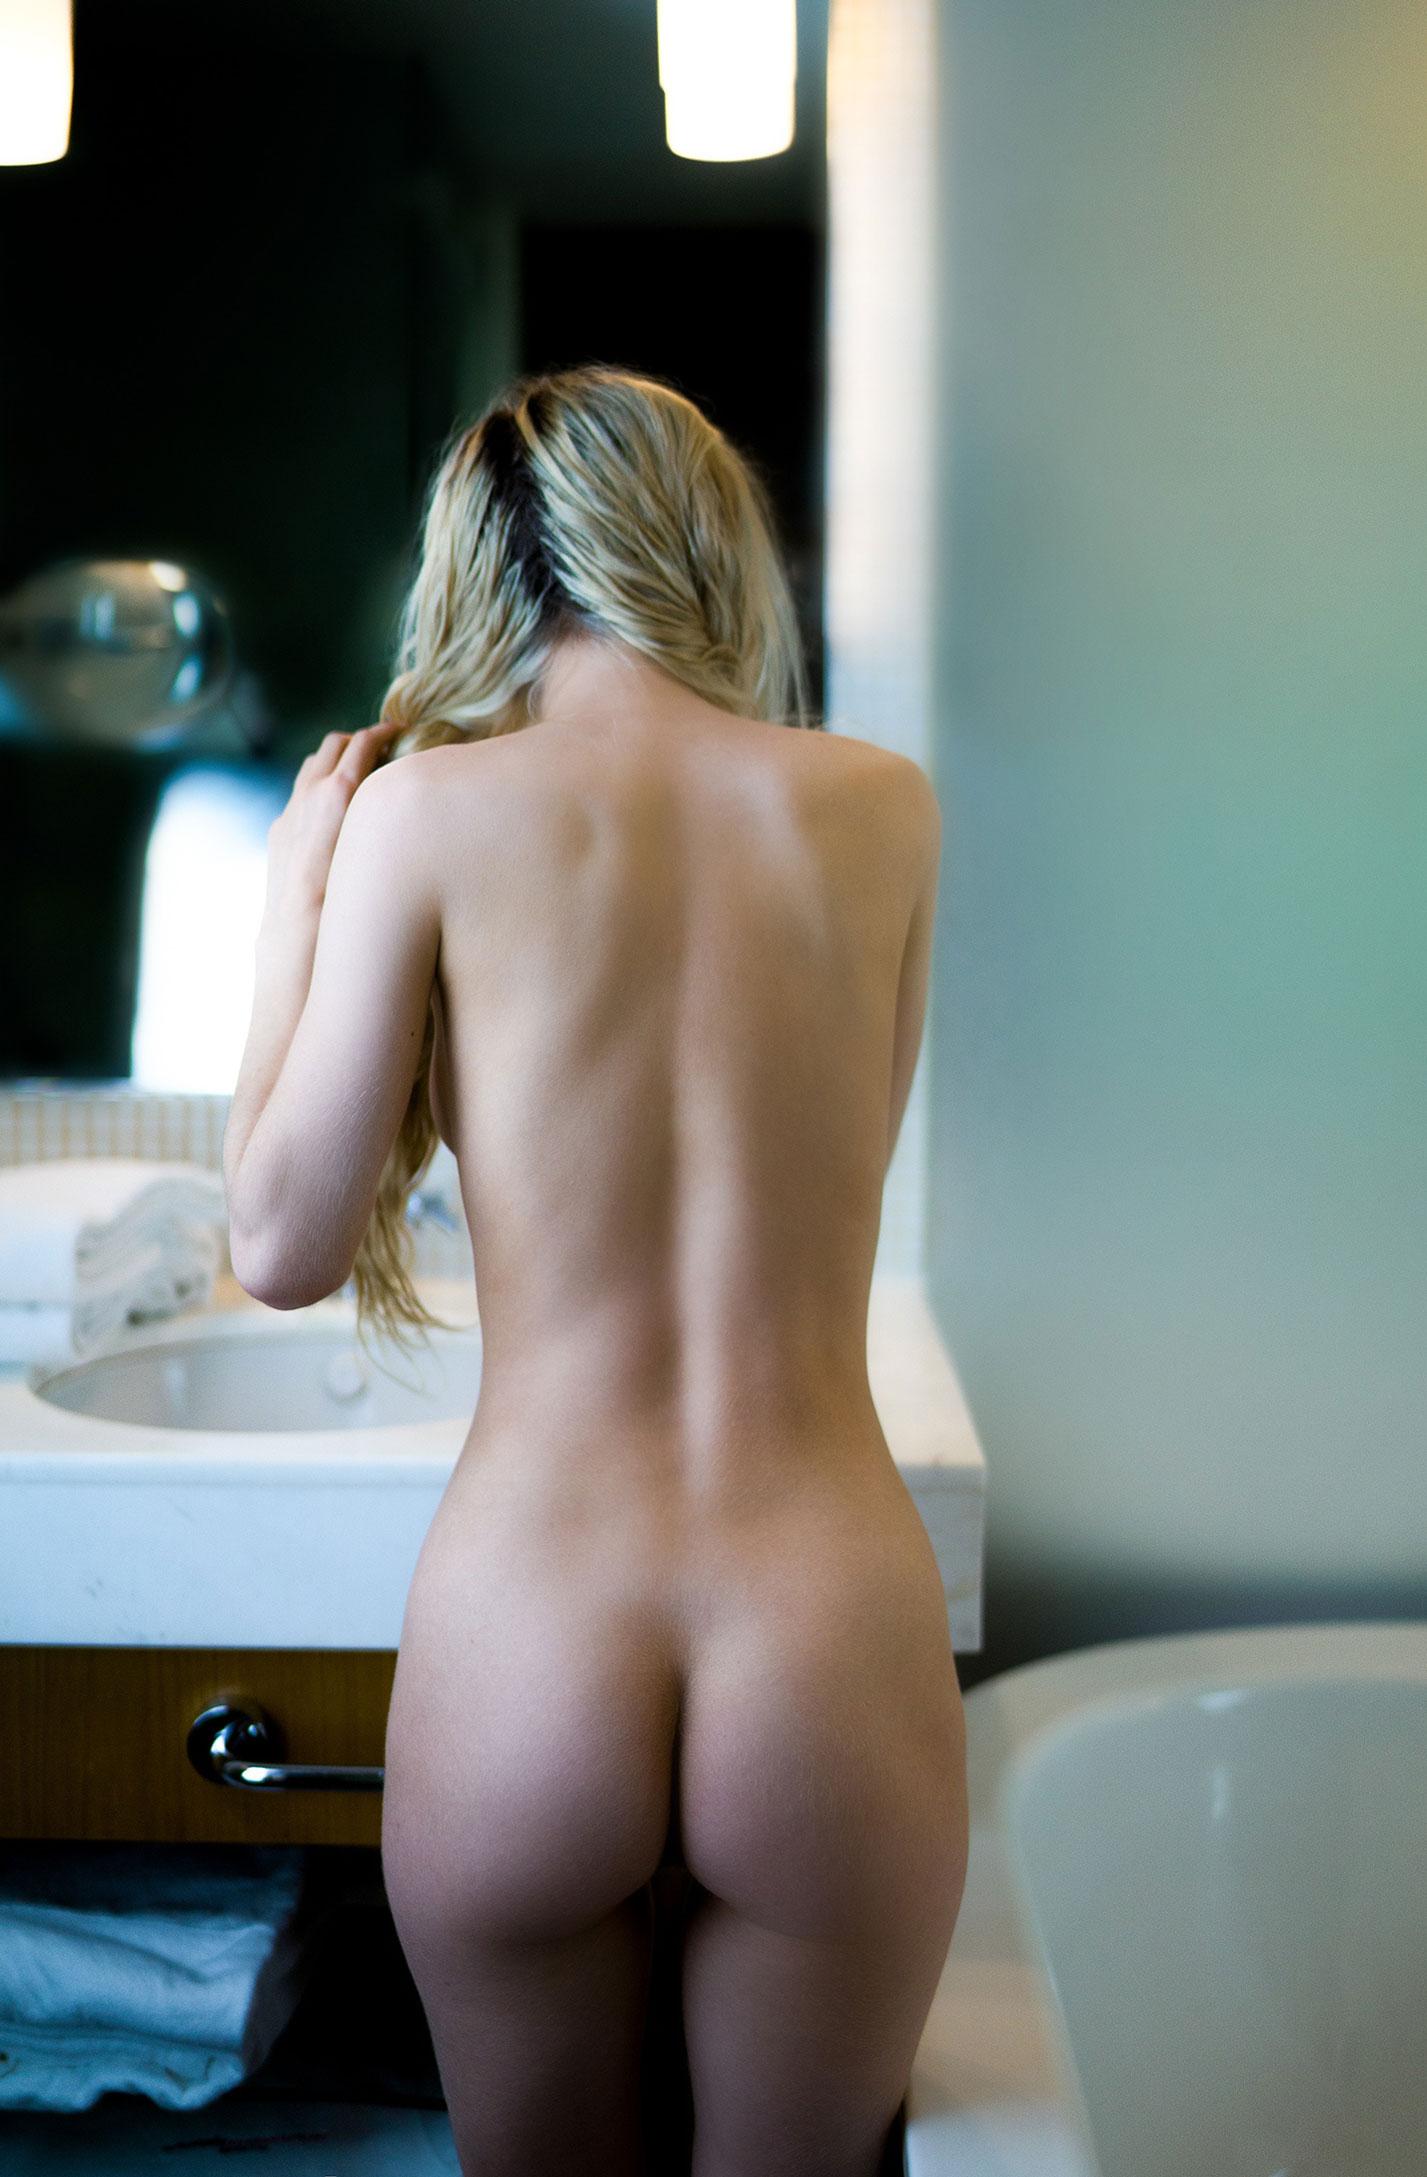 Александра Смелова принимает ванну / фото 09